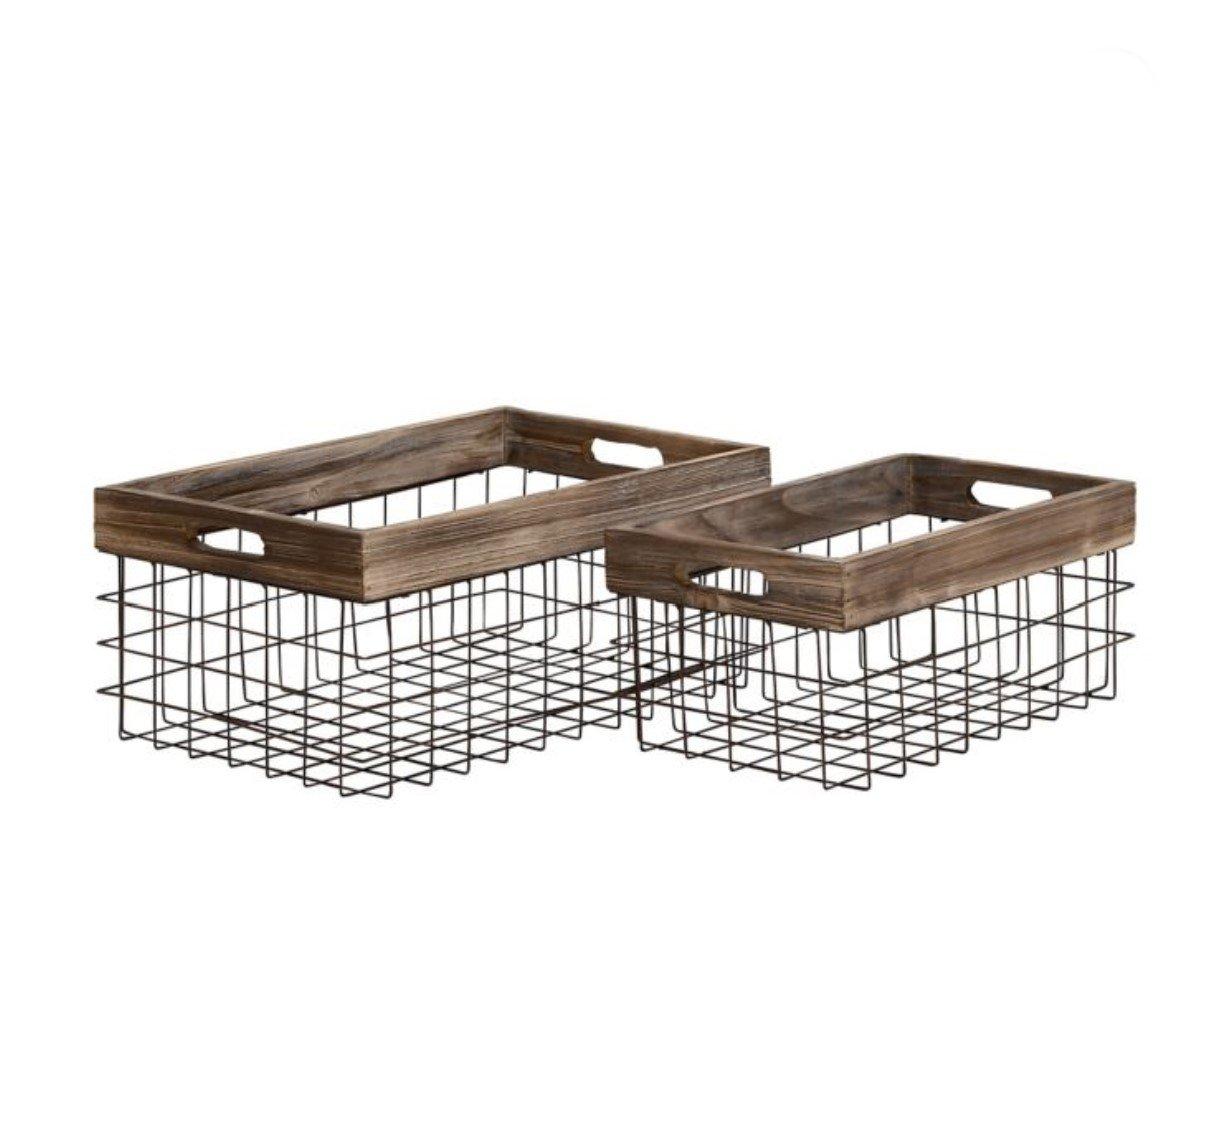 Wood and iron basket